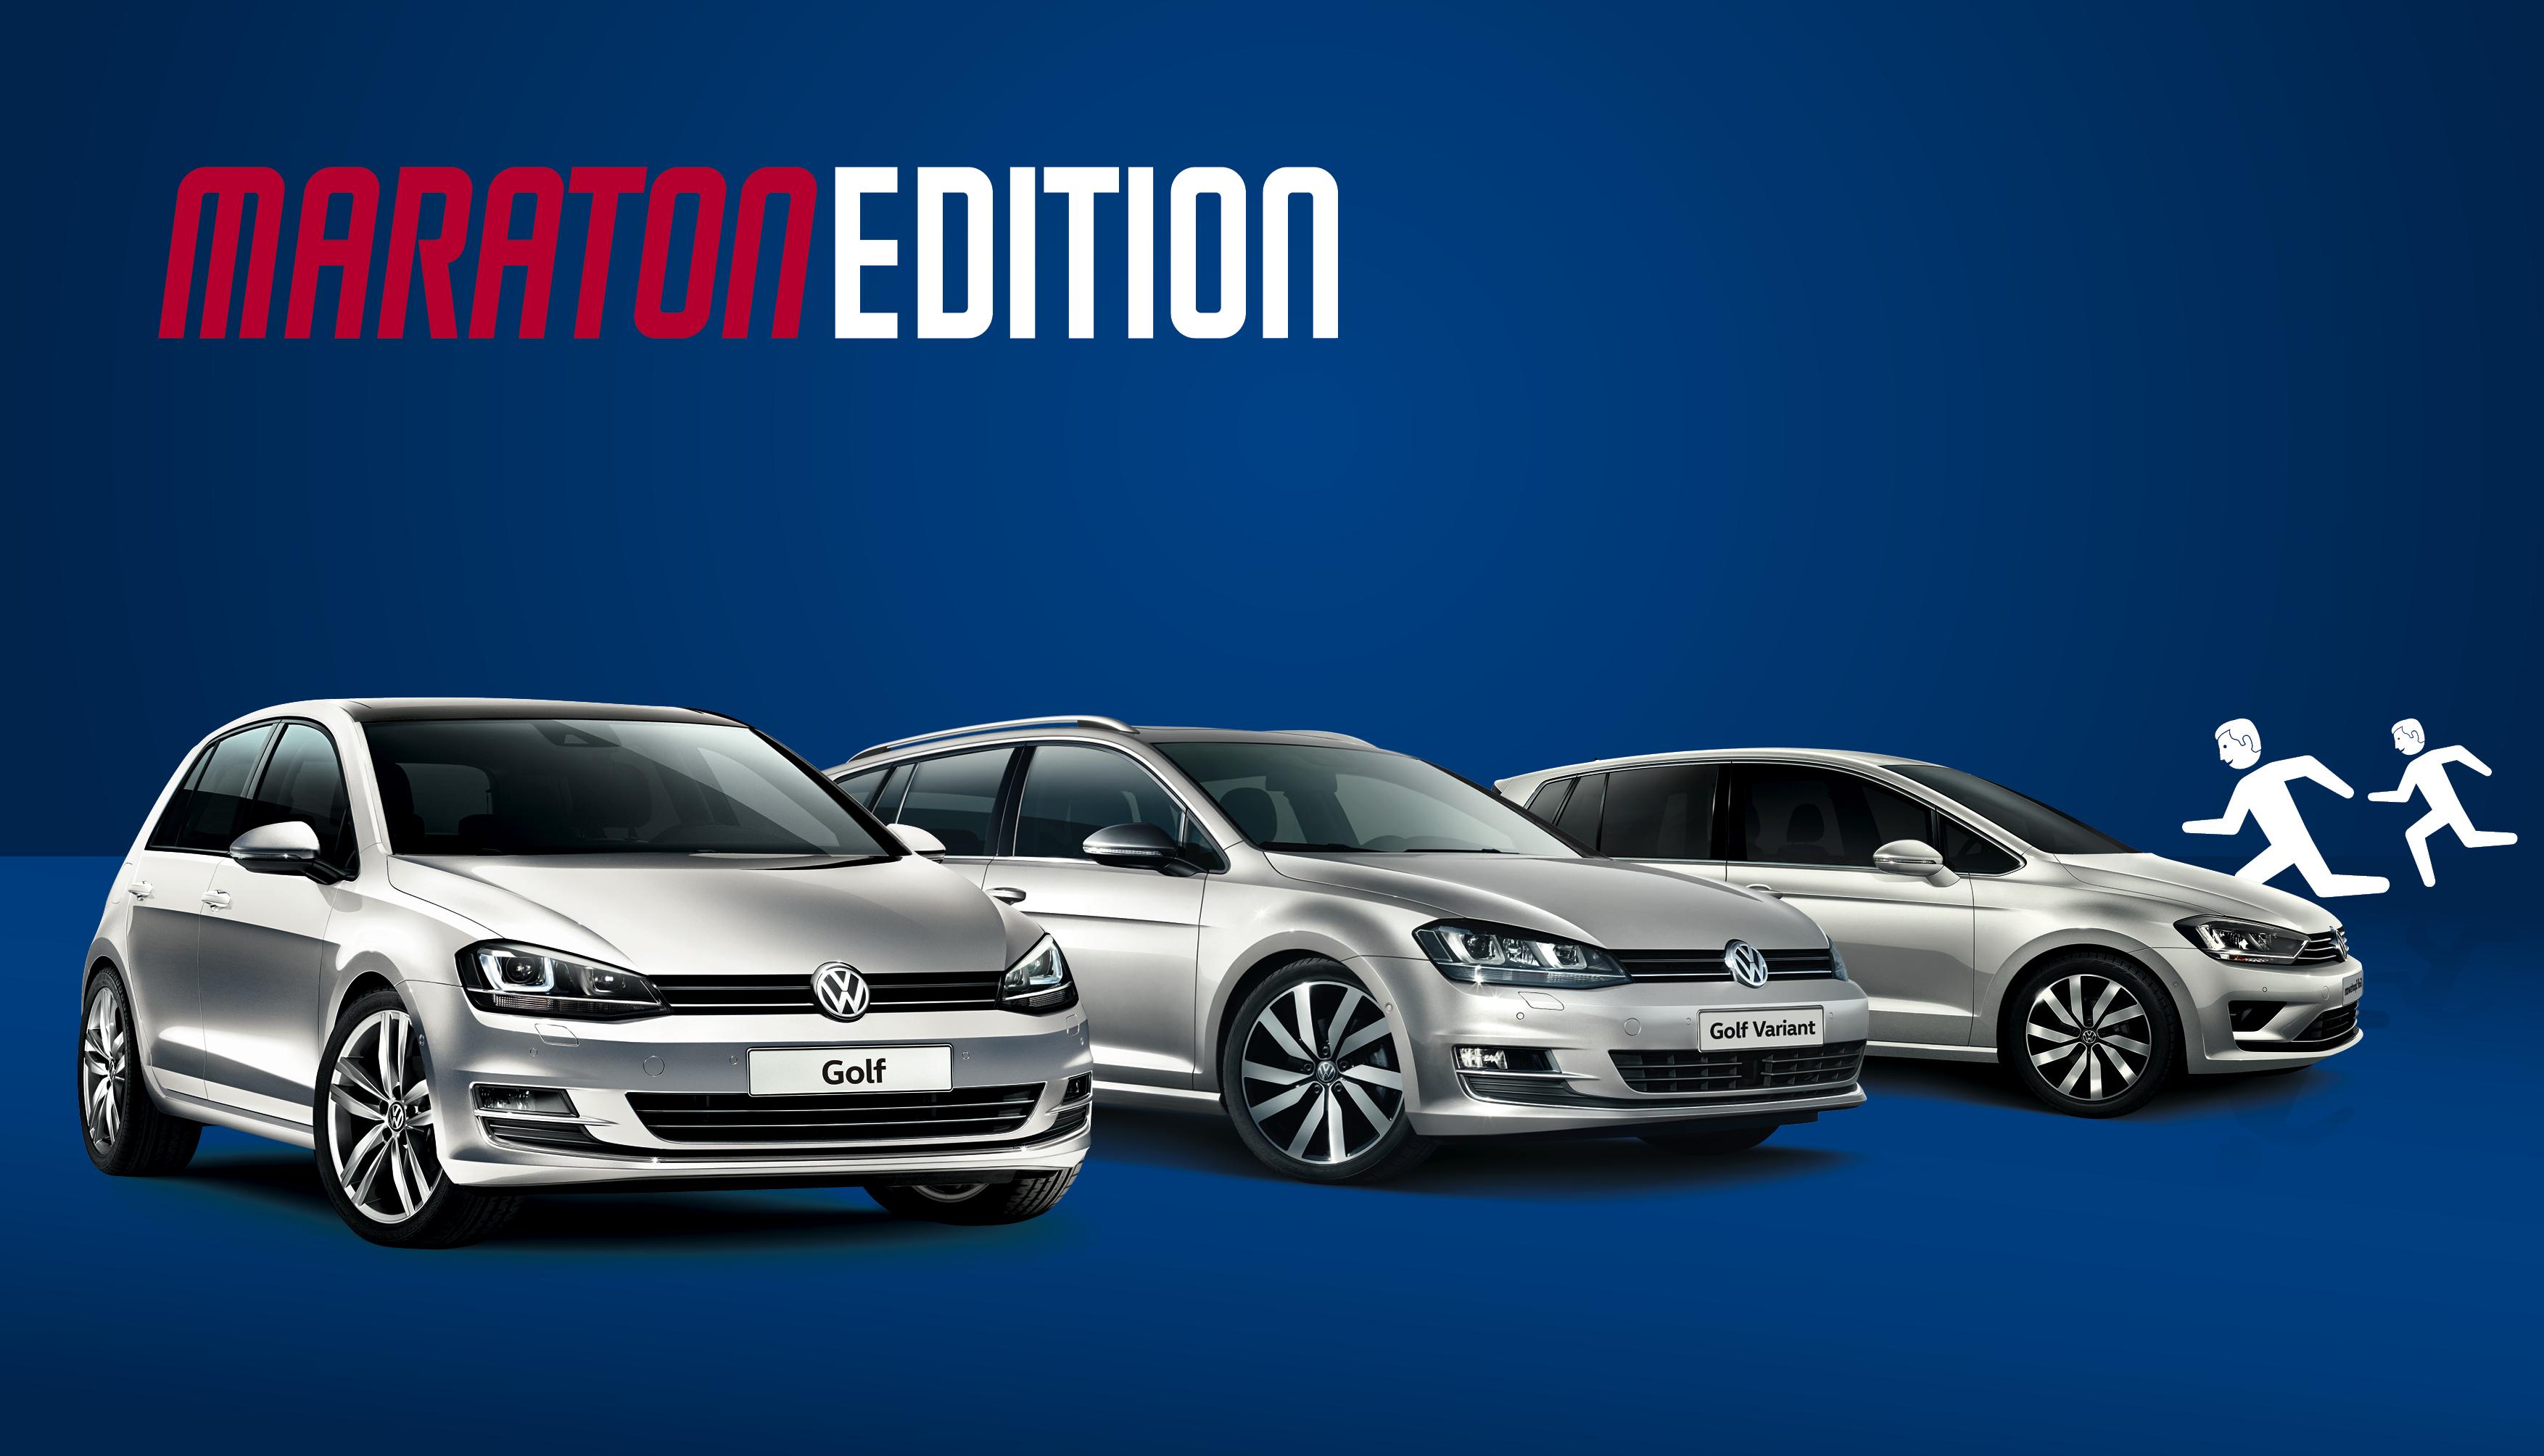 Volkswagen-Maraton-Edition-03